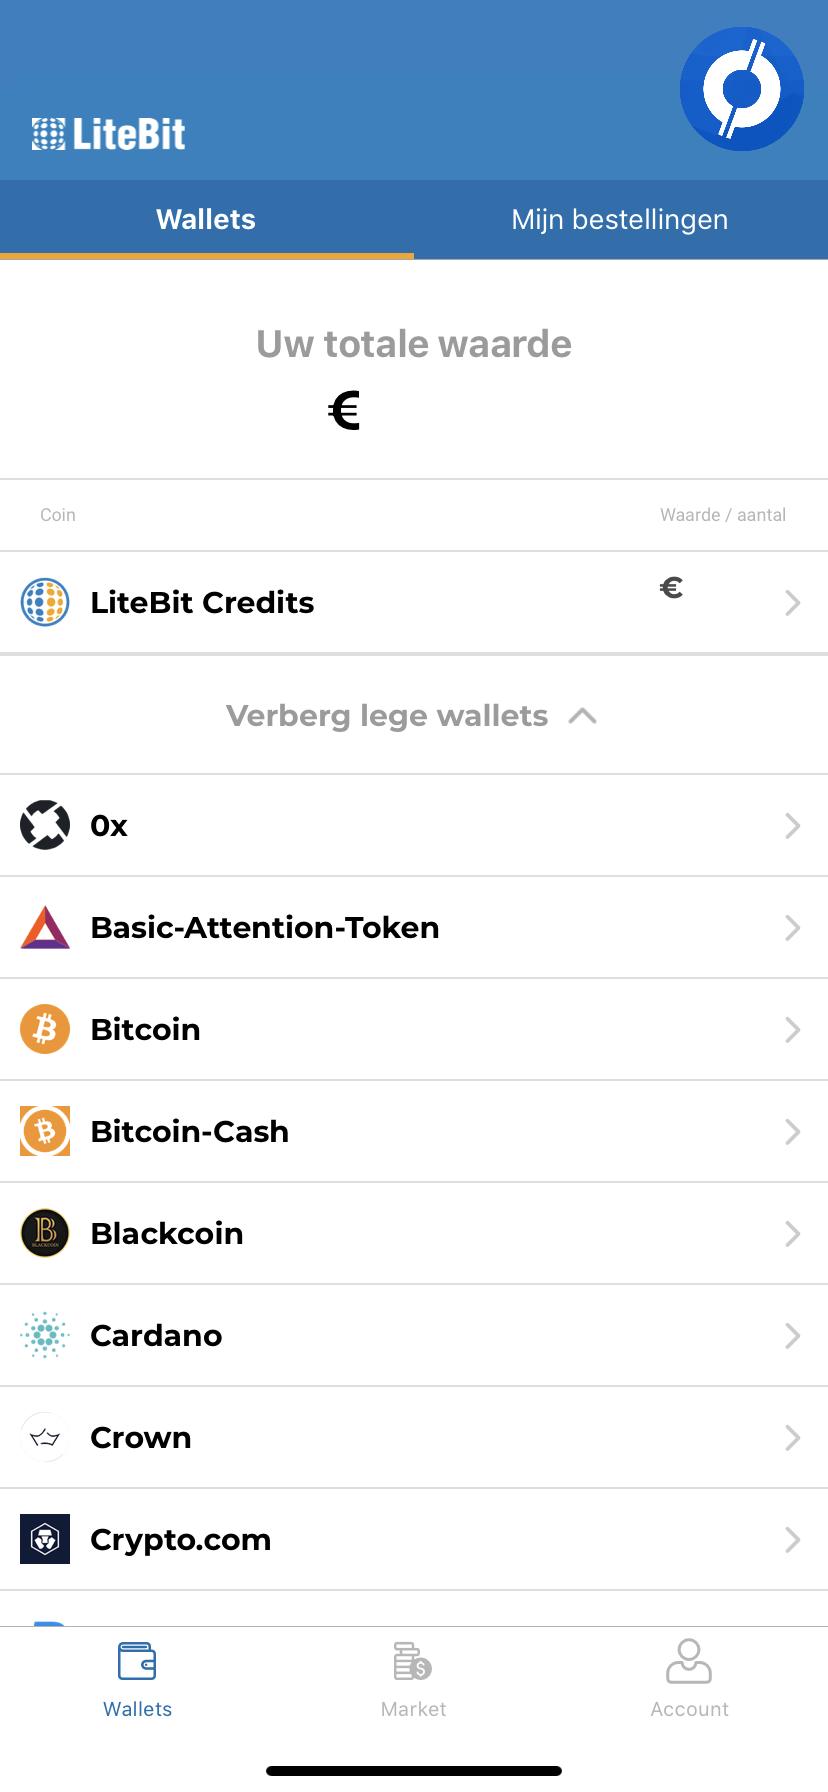 LiteBit app with Wallet and cryptocurrencies shown